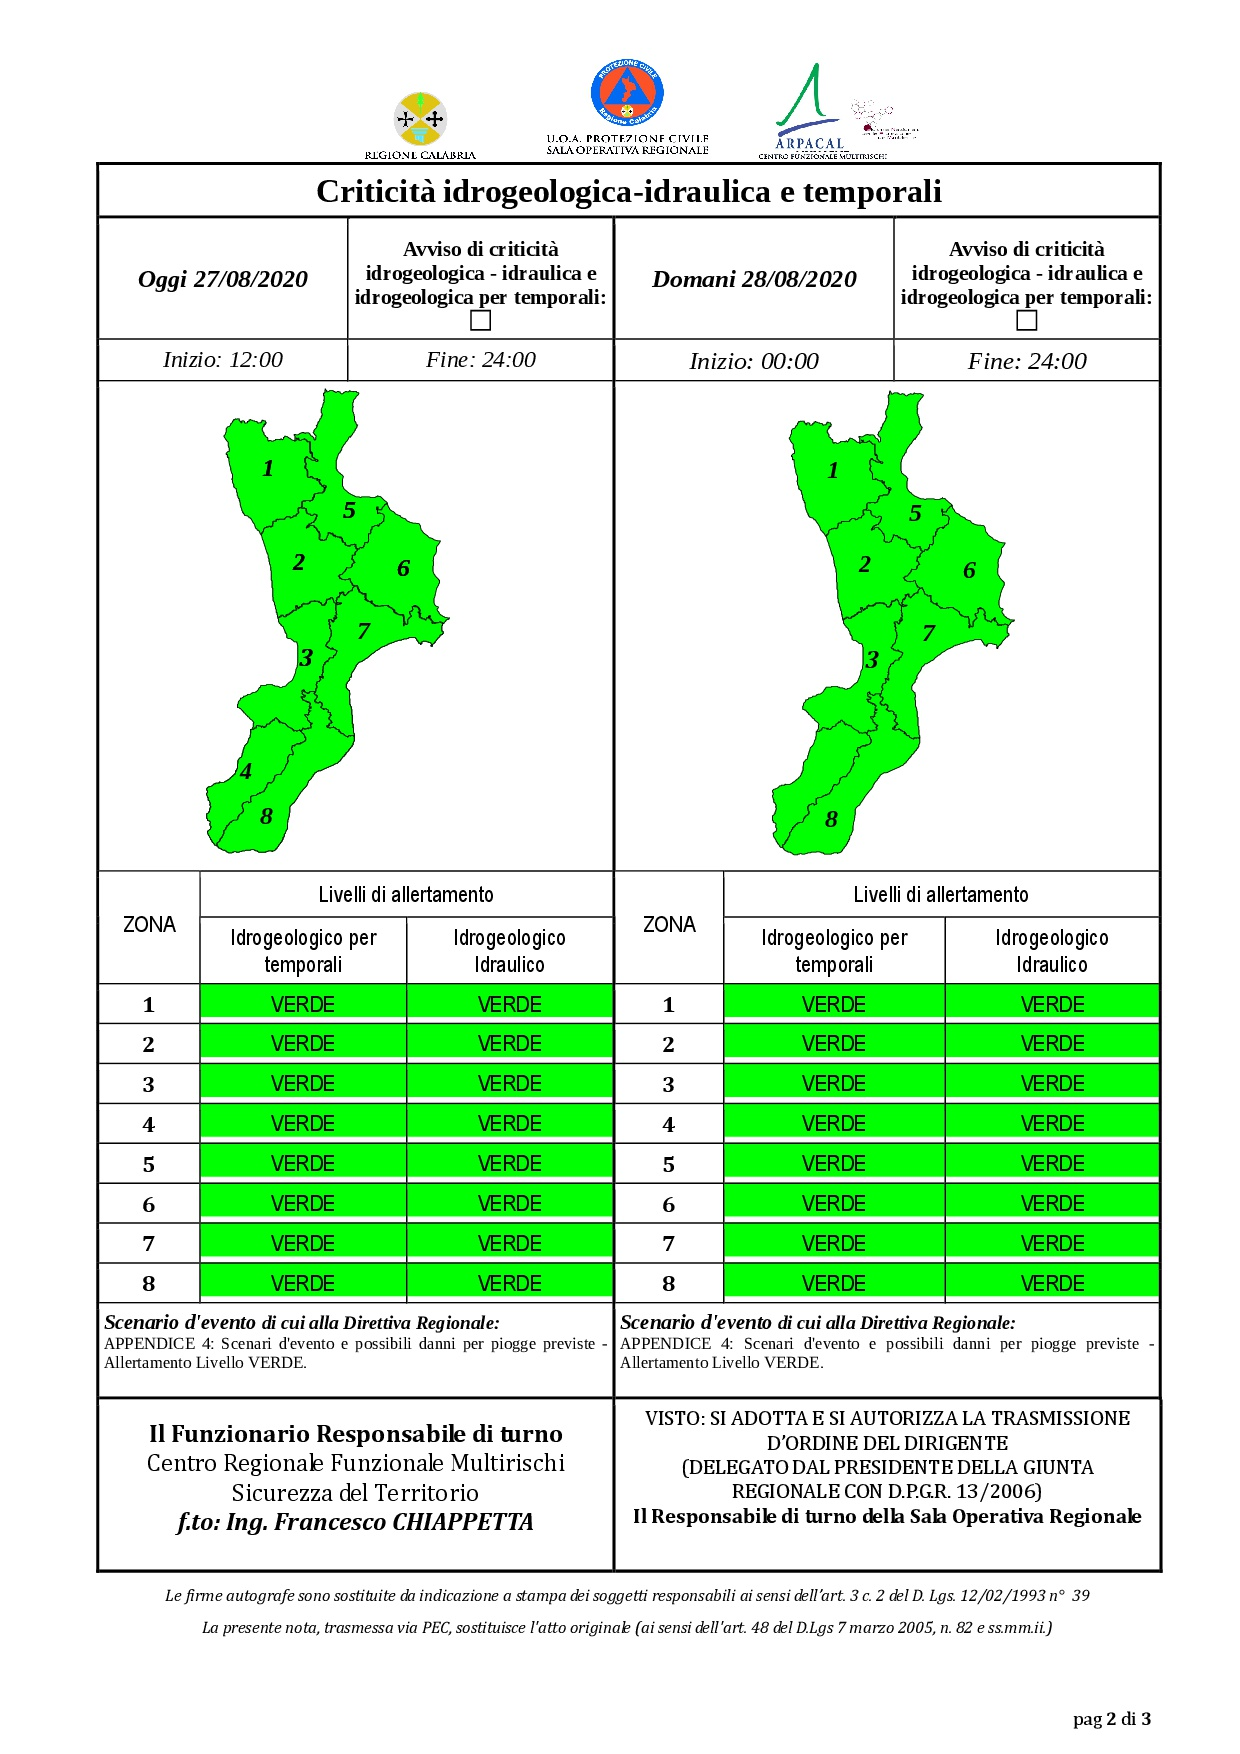 Criticità idrogeologica-idraulica e temporali in Calabria 27-08-2020